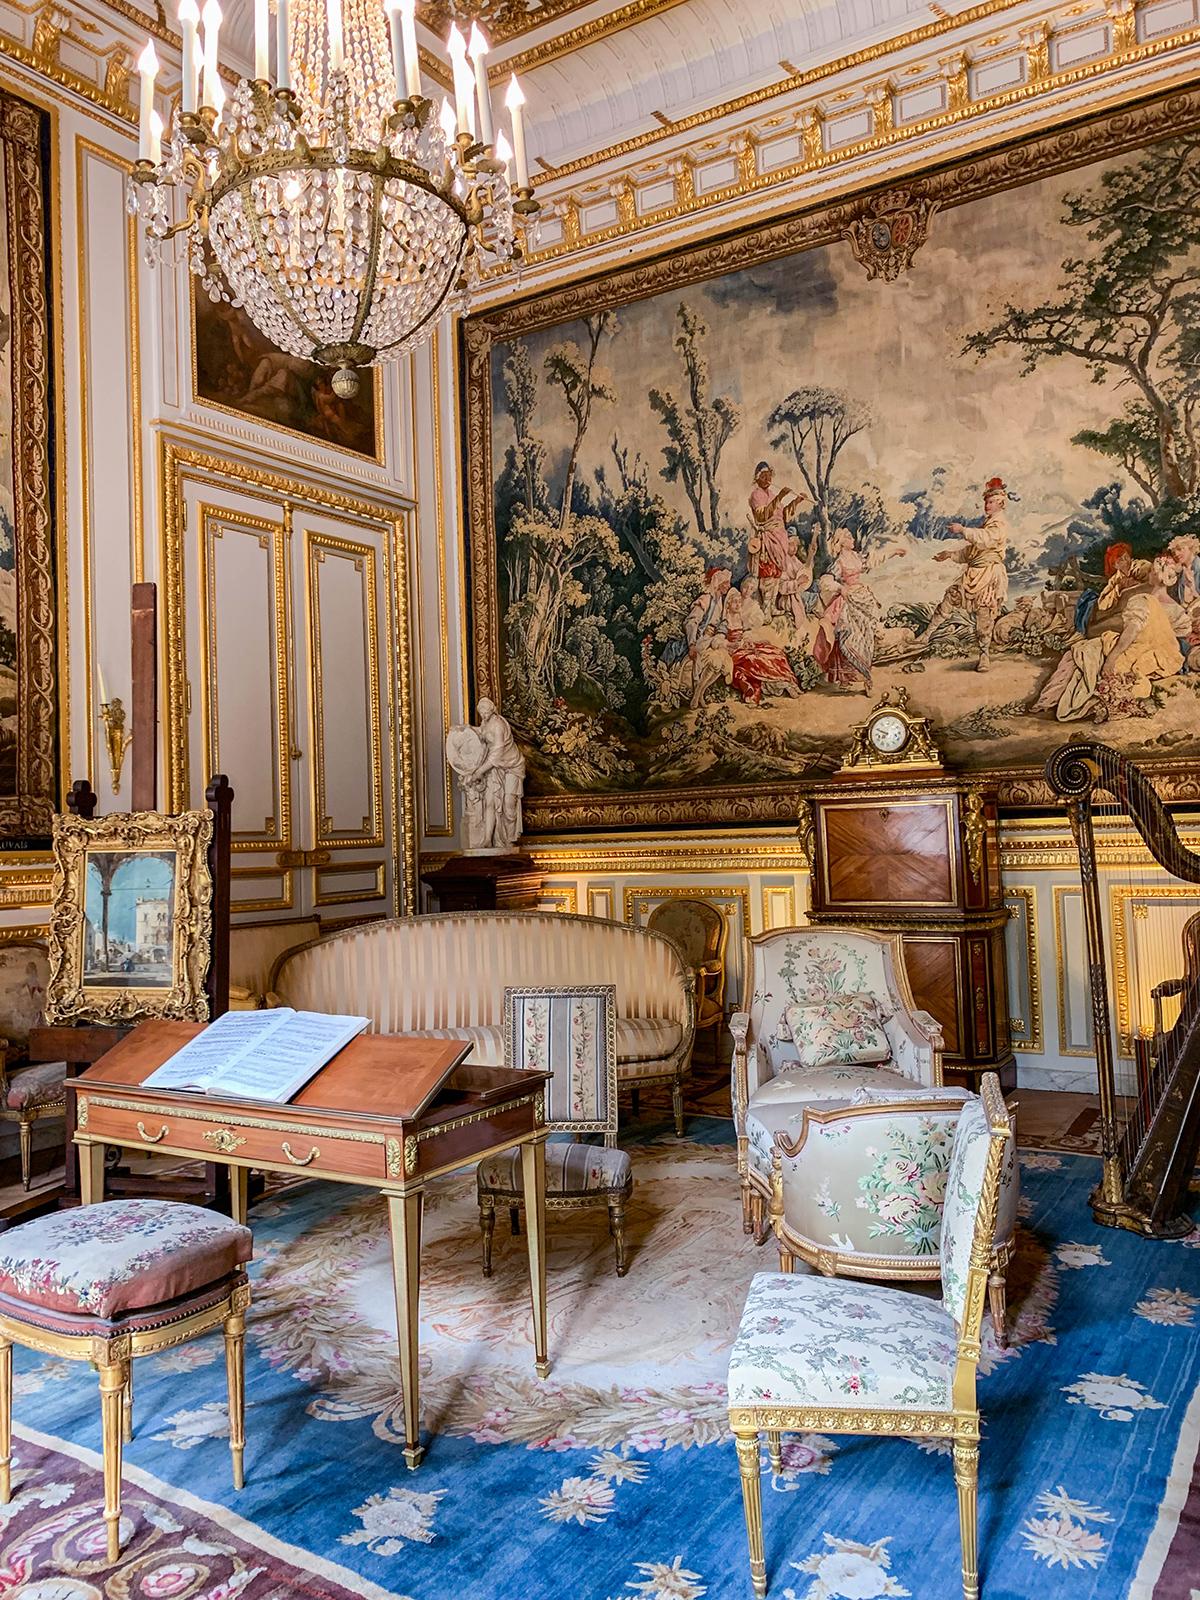 Paris Honeymoon Travel Guide